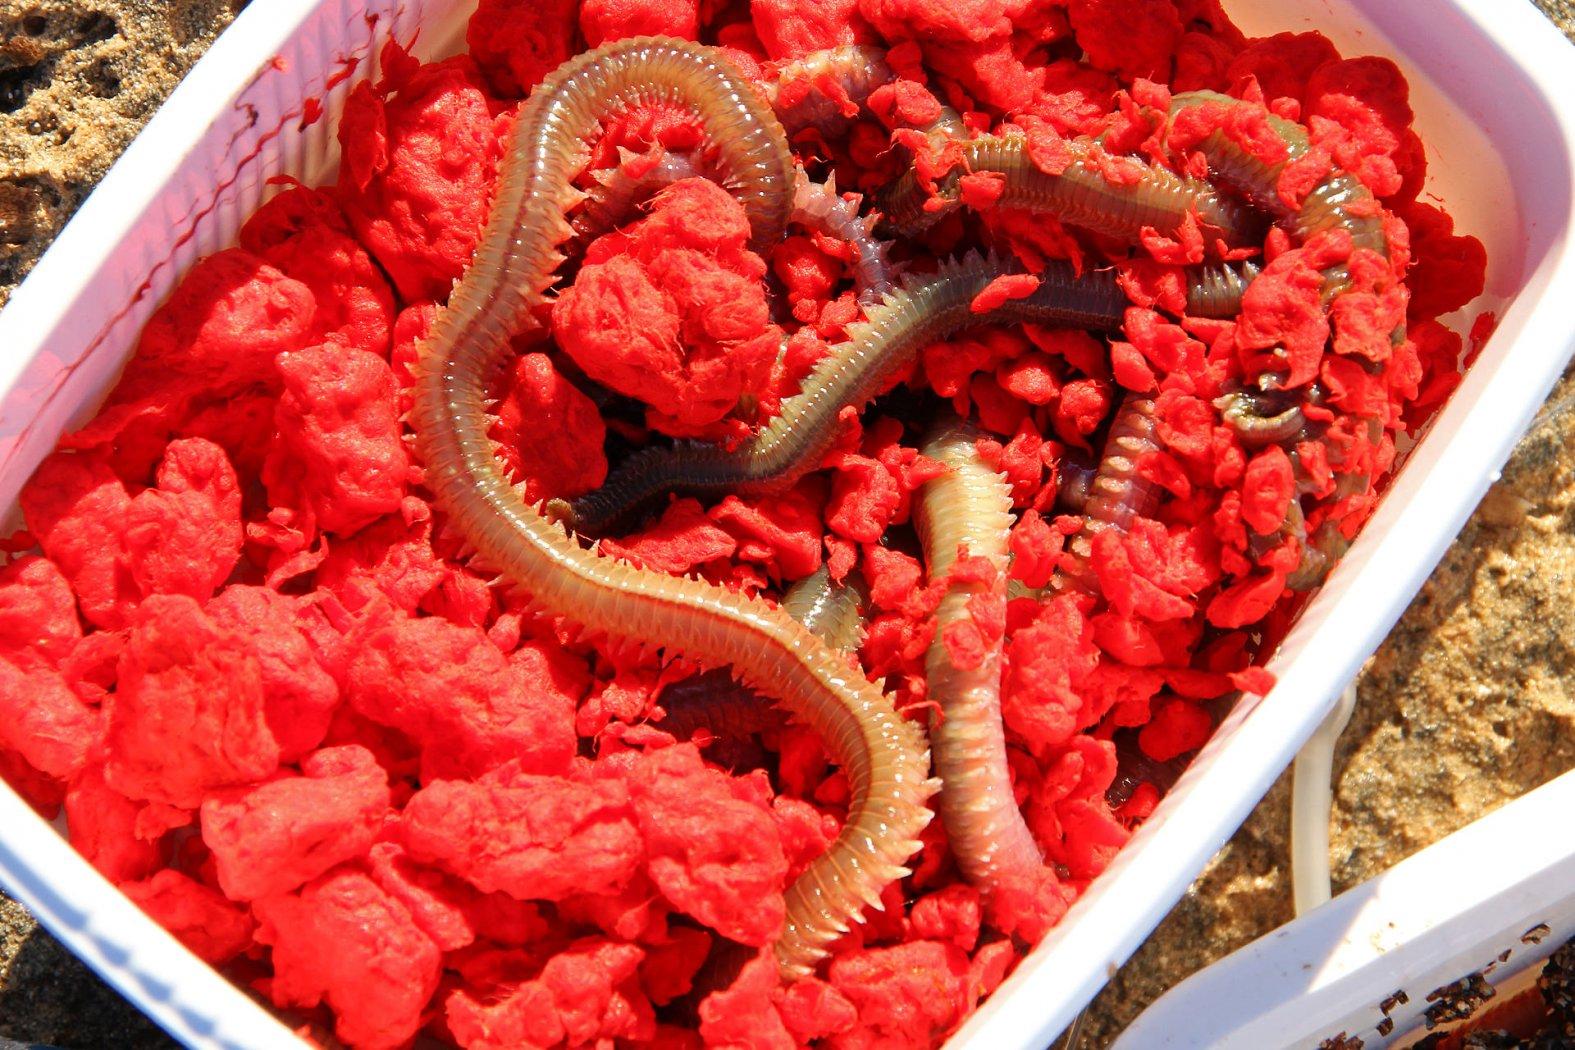 Seeringelwurm als Köder am Mittelmeer